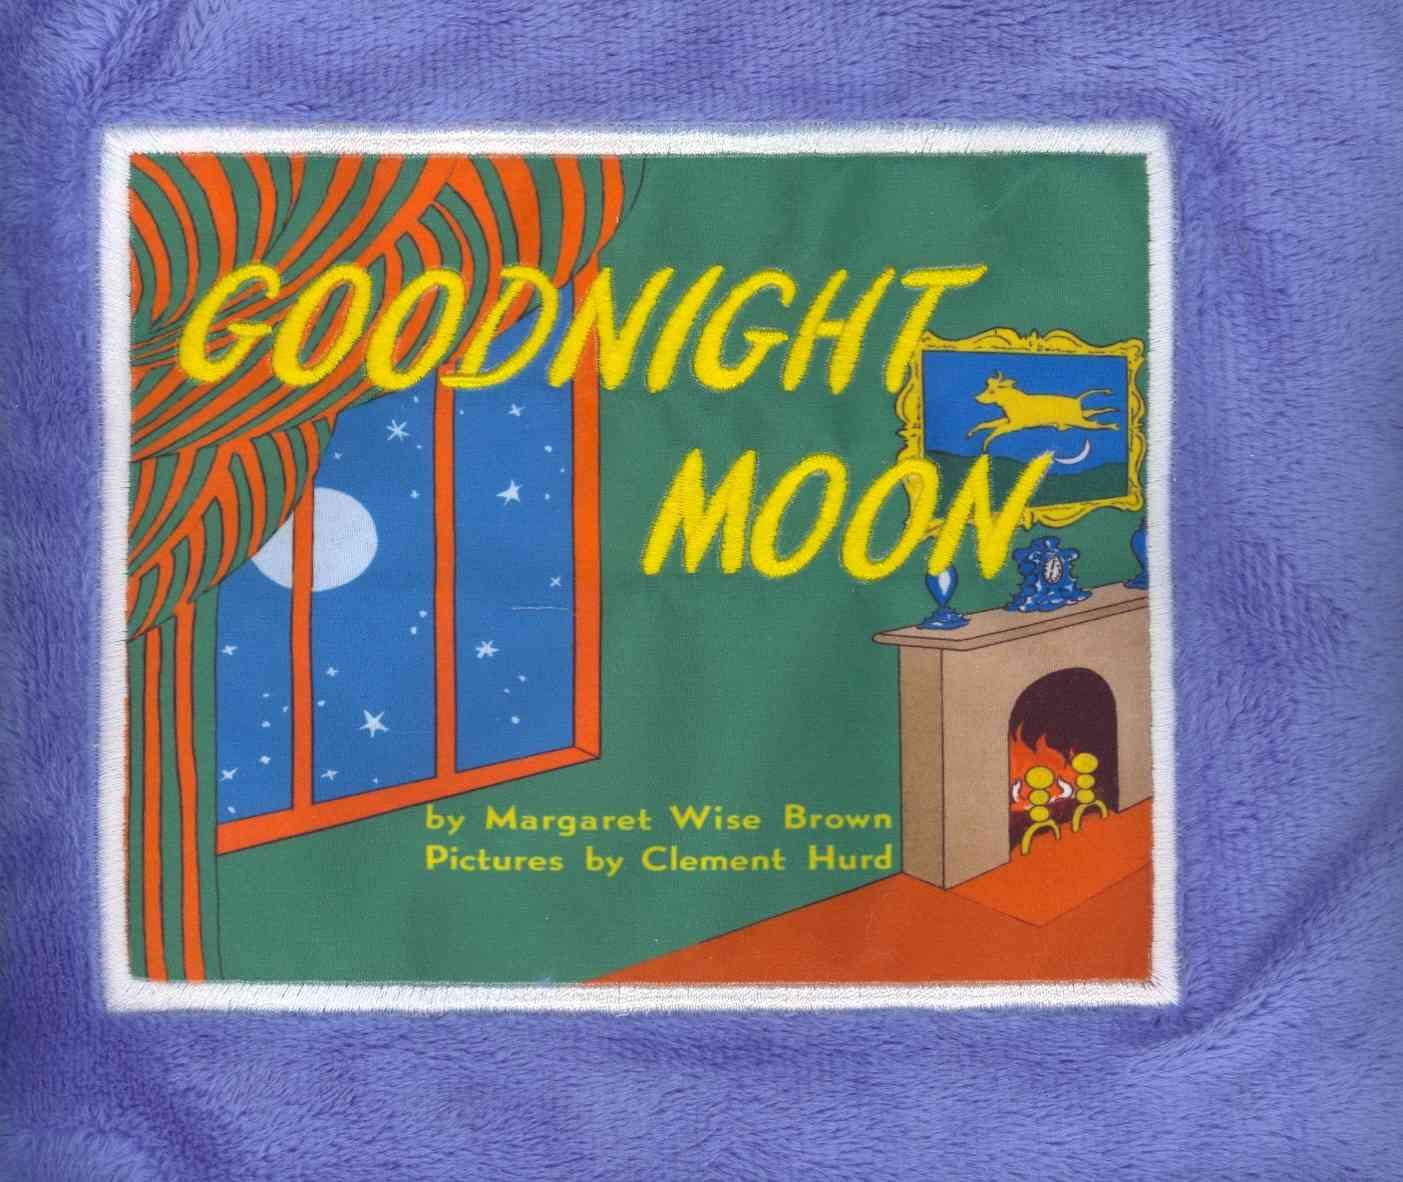 Goodnight Moon Margaret Wise/ Hurd, Clement (Ilt) Brown